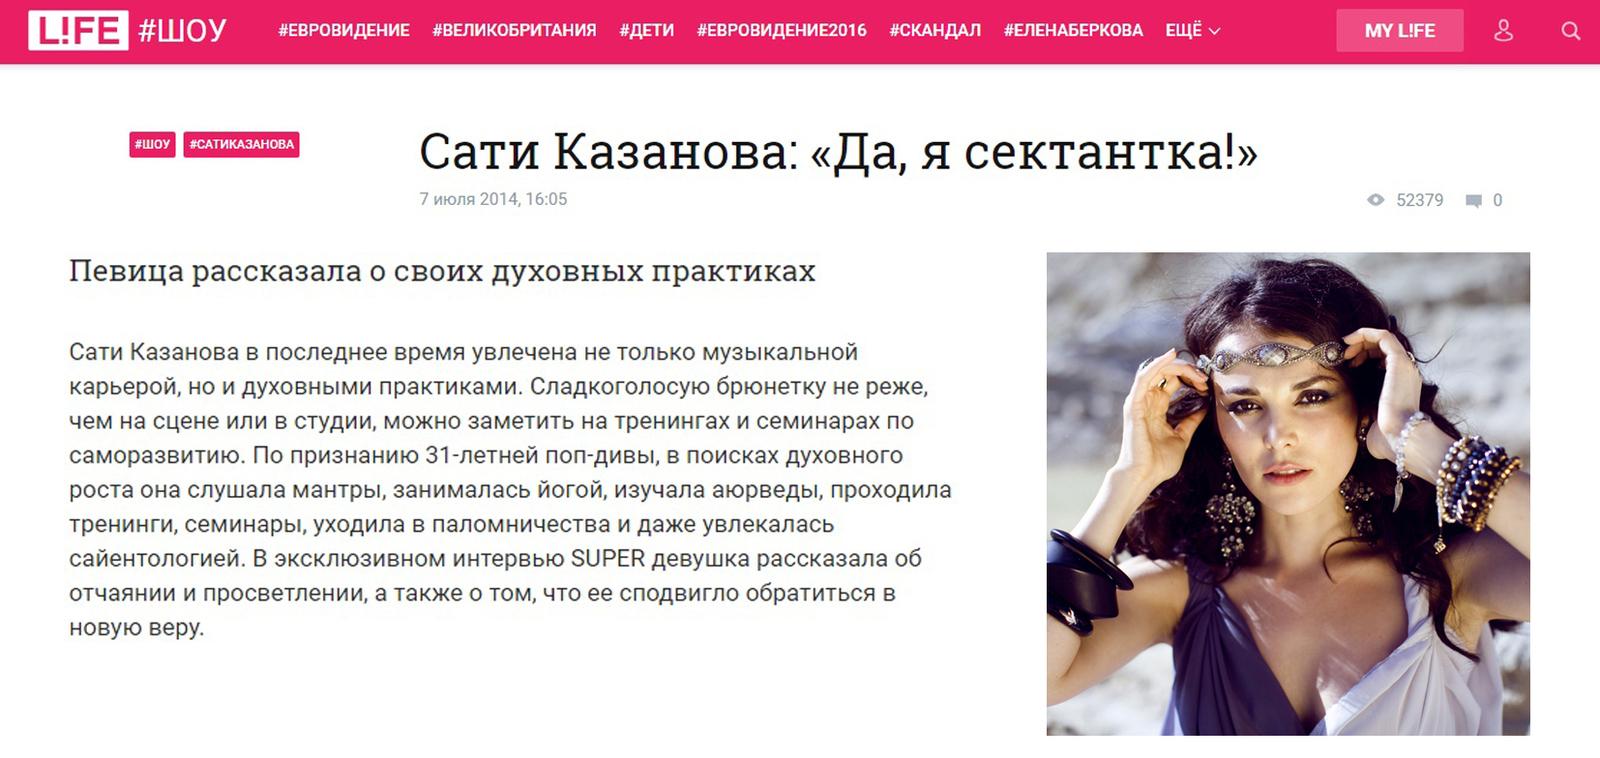 07.07.2014.Сати Казанова. Да, я сектантка!